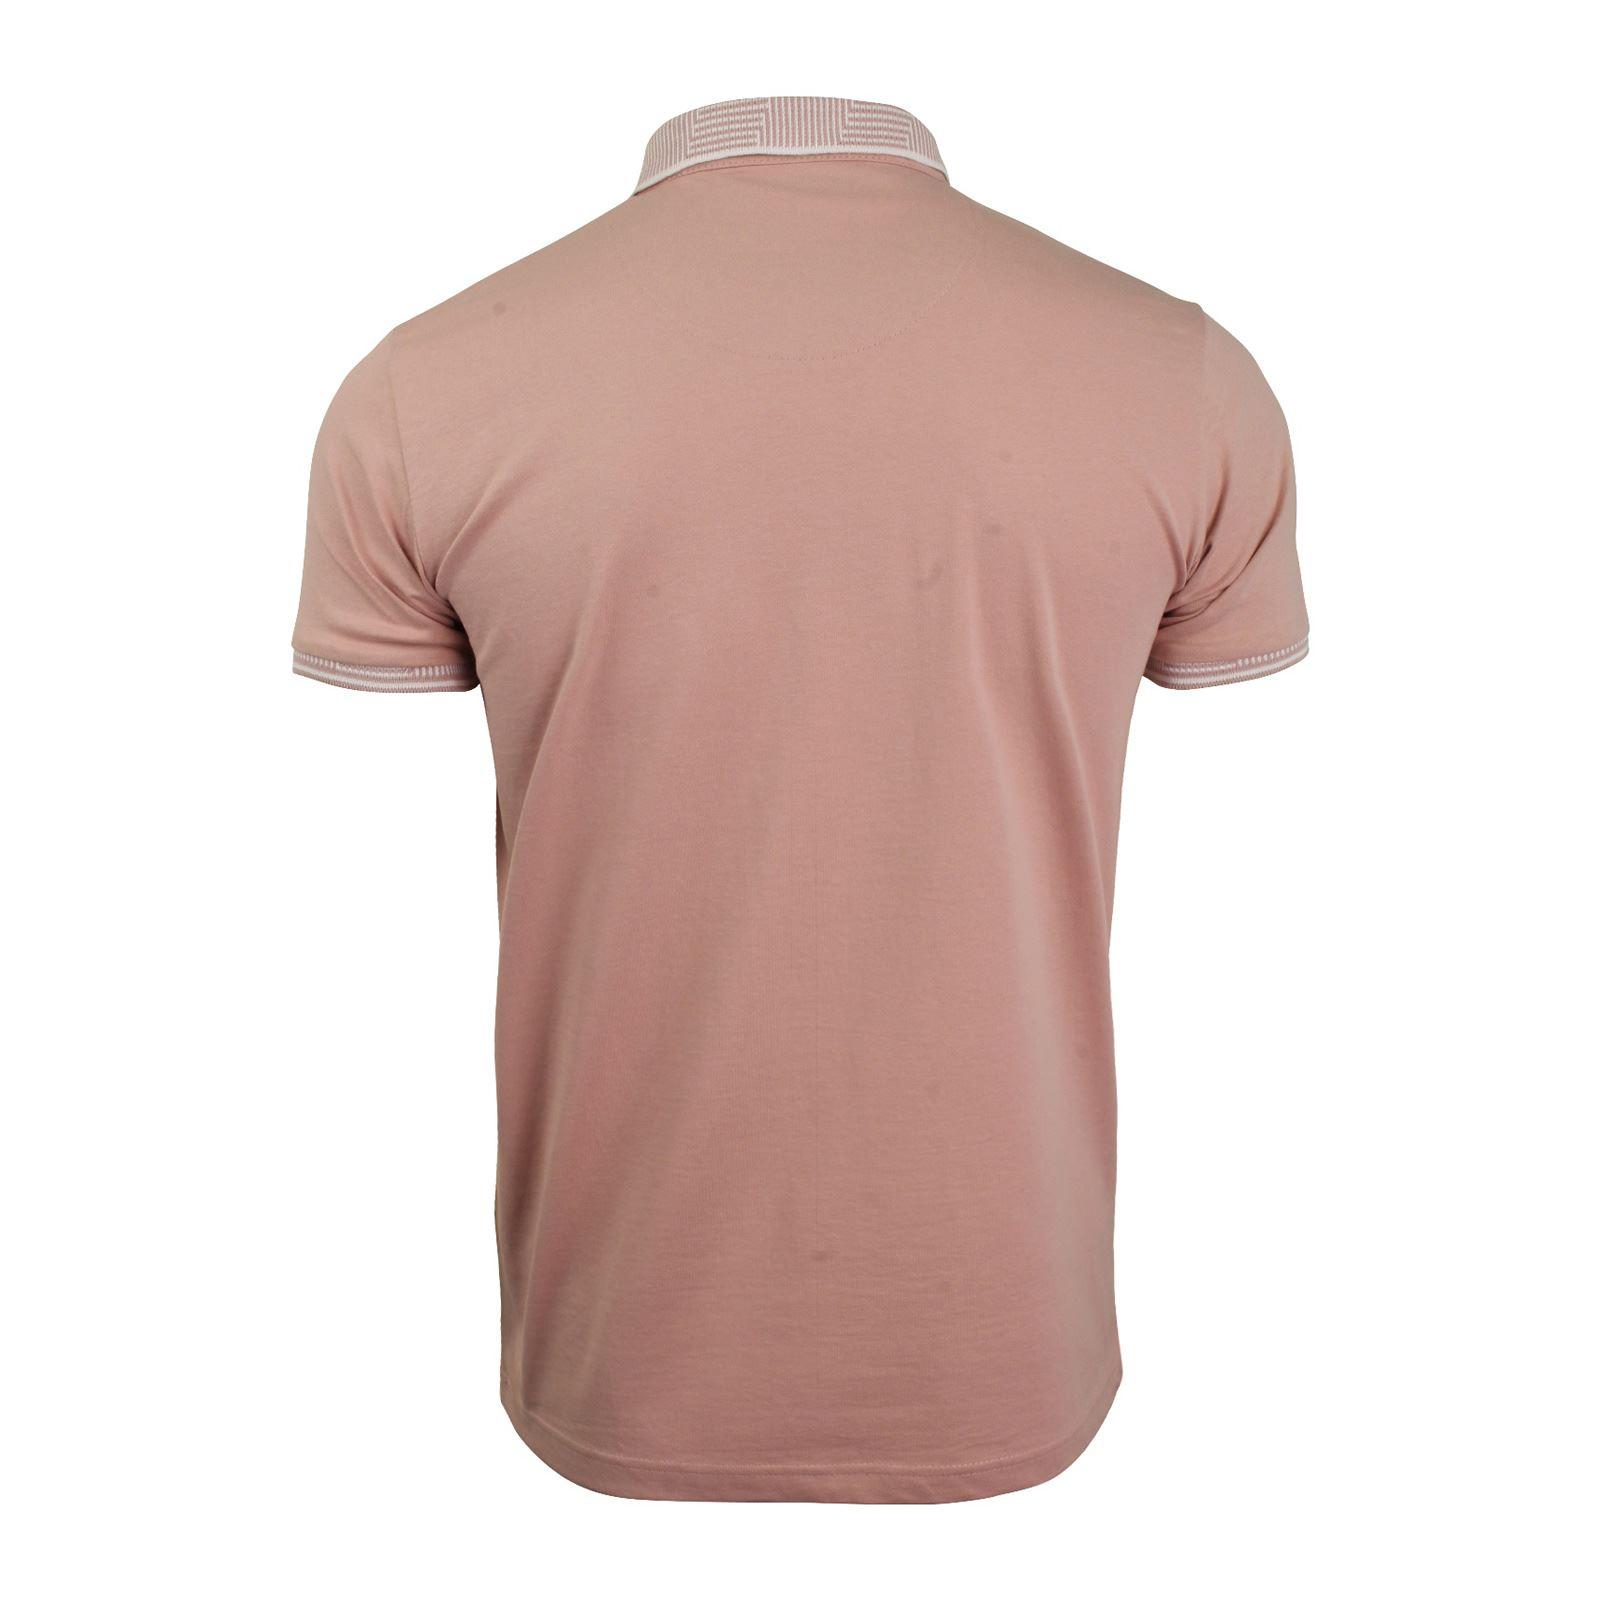 Para-Hombre-Polo-T-Shirt-Alma-valiente-Glover-Algodon-Con-Cuello-Y-Manga-Corta-Casual-Top miniatura 9